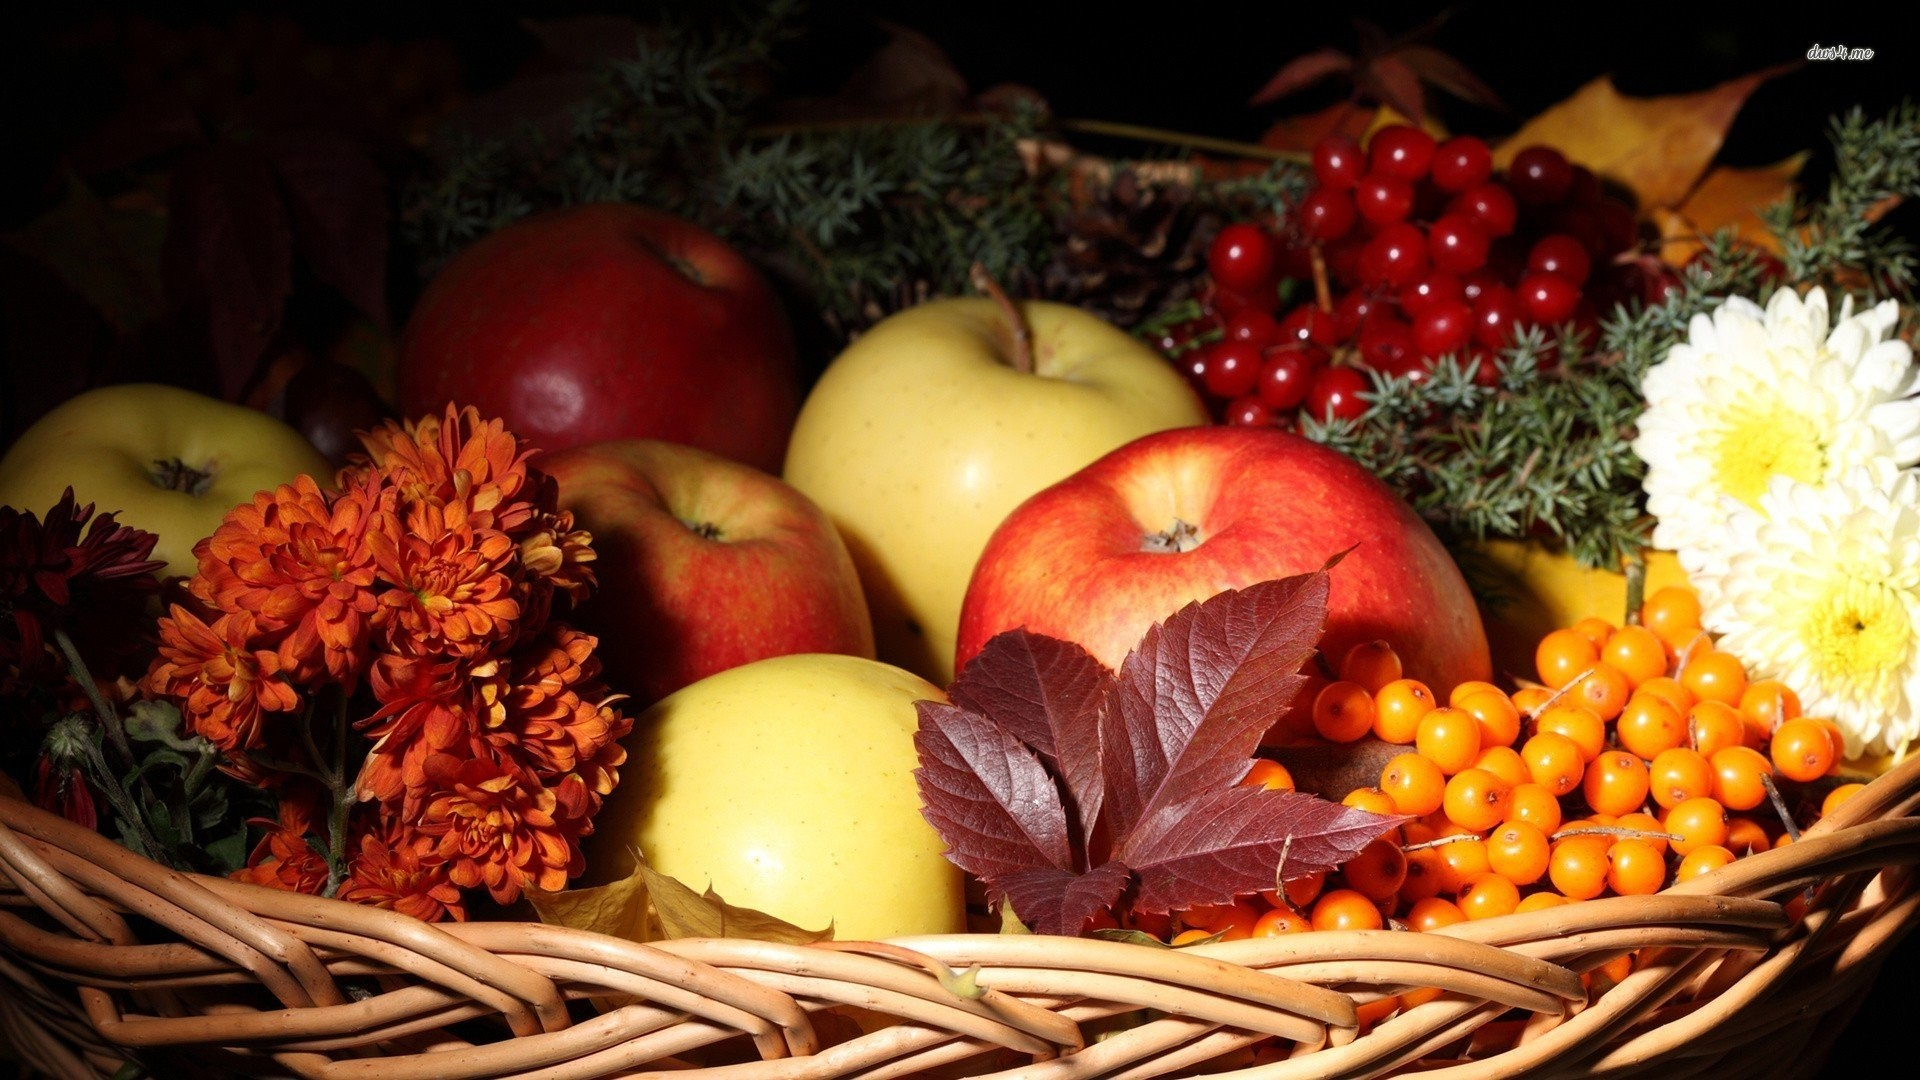 Res: 1920x1080, autumn fruit basket